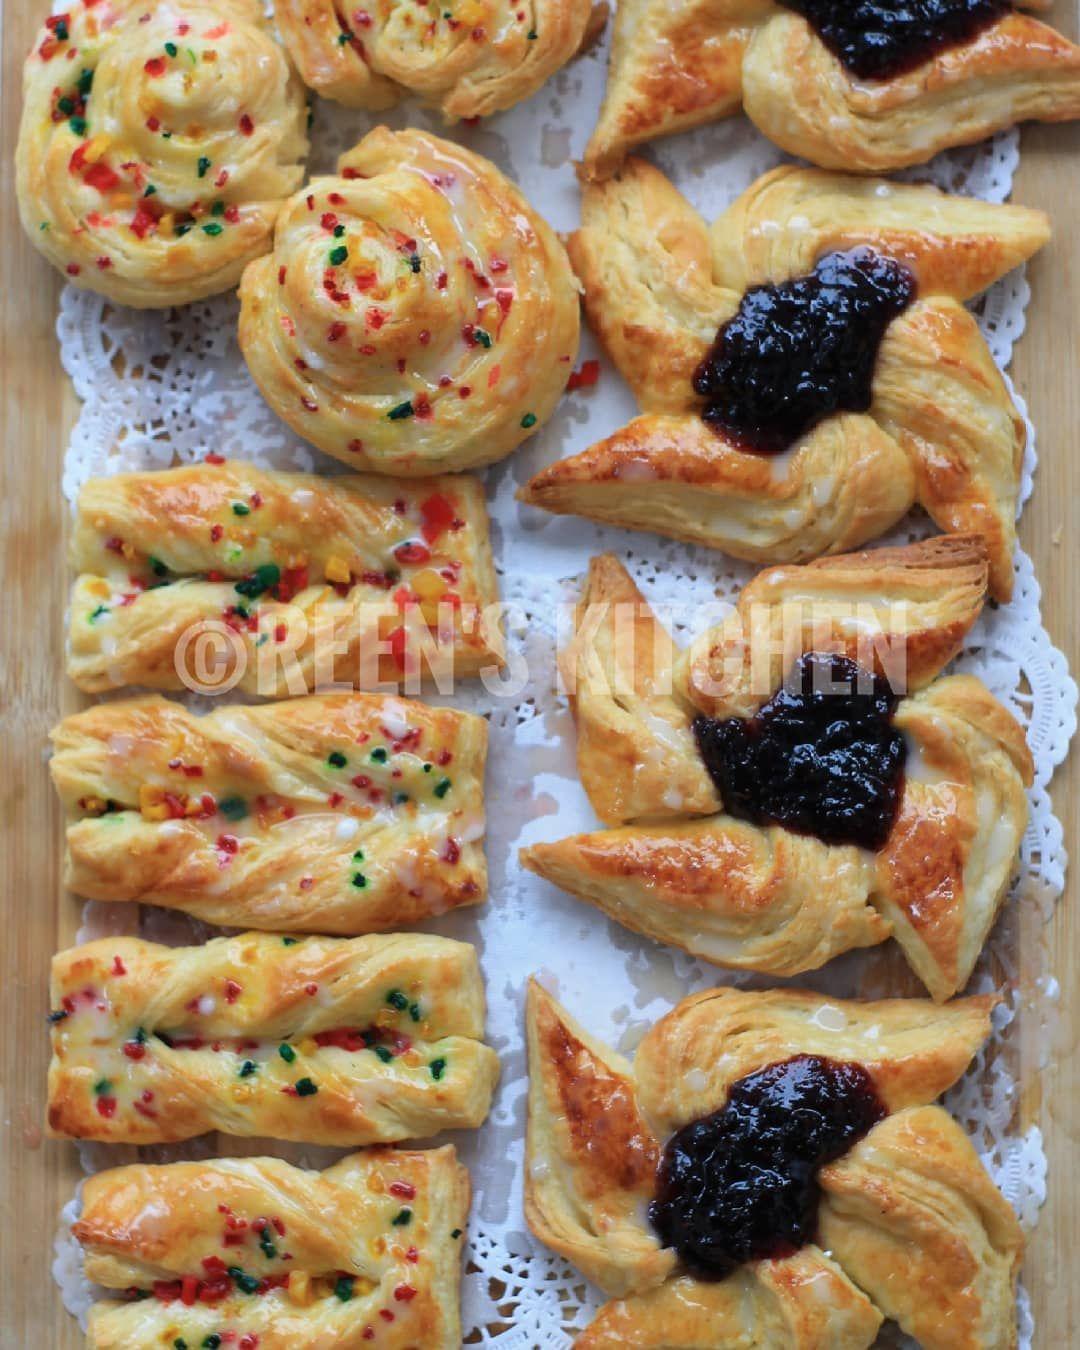 2 480 Likes 54 Comments Reen S Kitchen Ms Rinadedik On Instagram Danish Pastry Tutorial Rinadedik Tutorialdanishpastry Ini Bukan Food Roti Breakfast